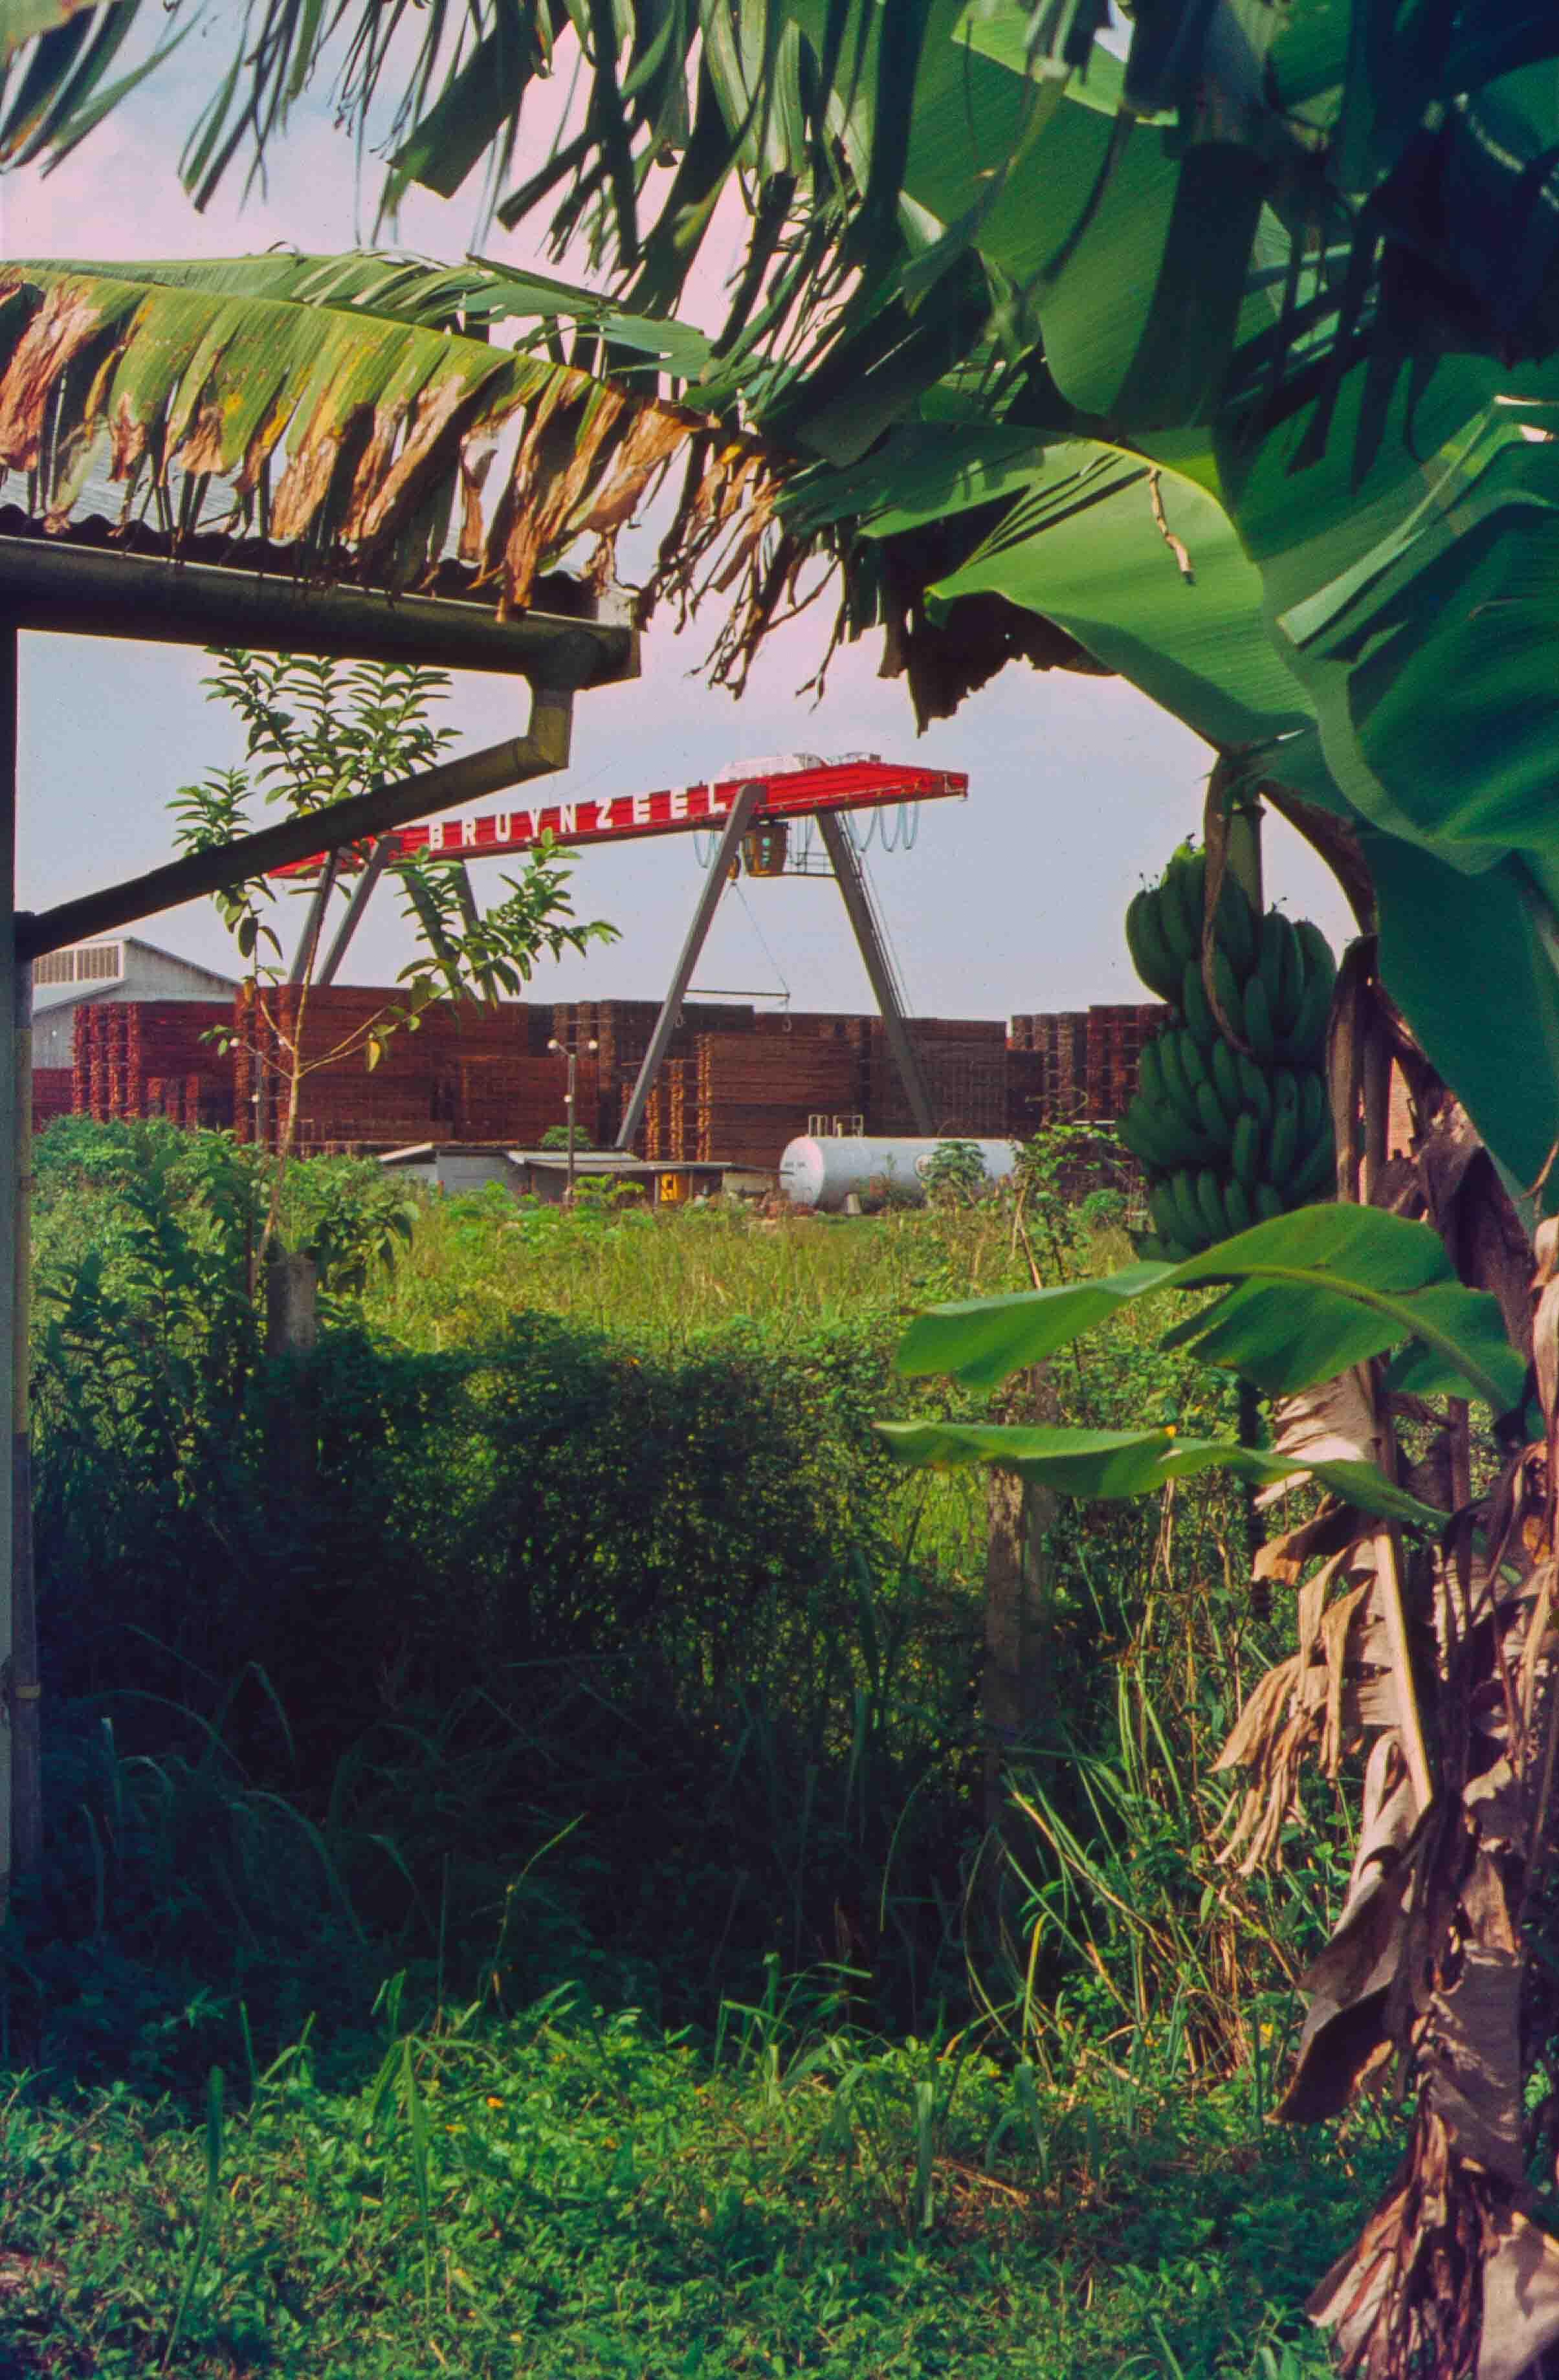 561. Suriname